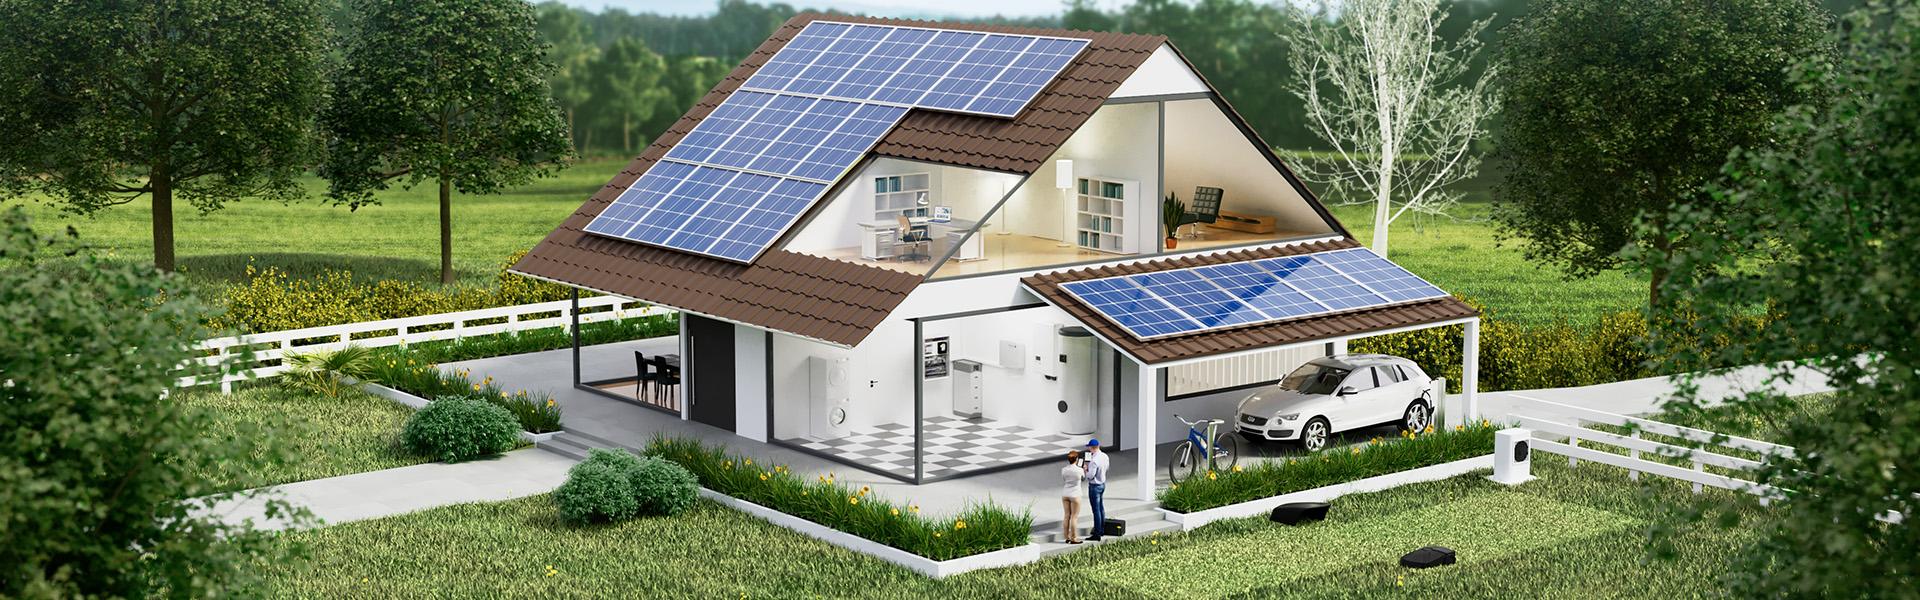 Inverters for residential solar+storage plants | KACO new energy